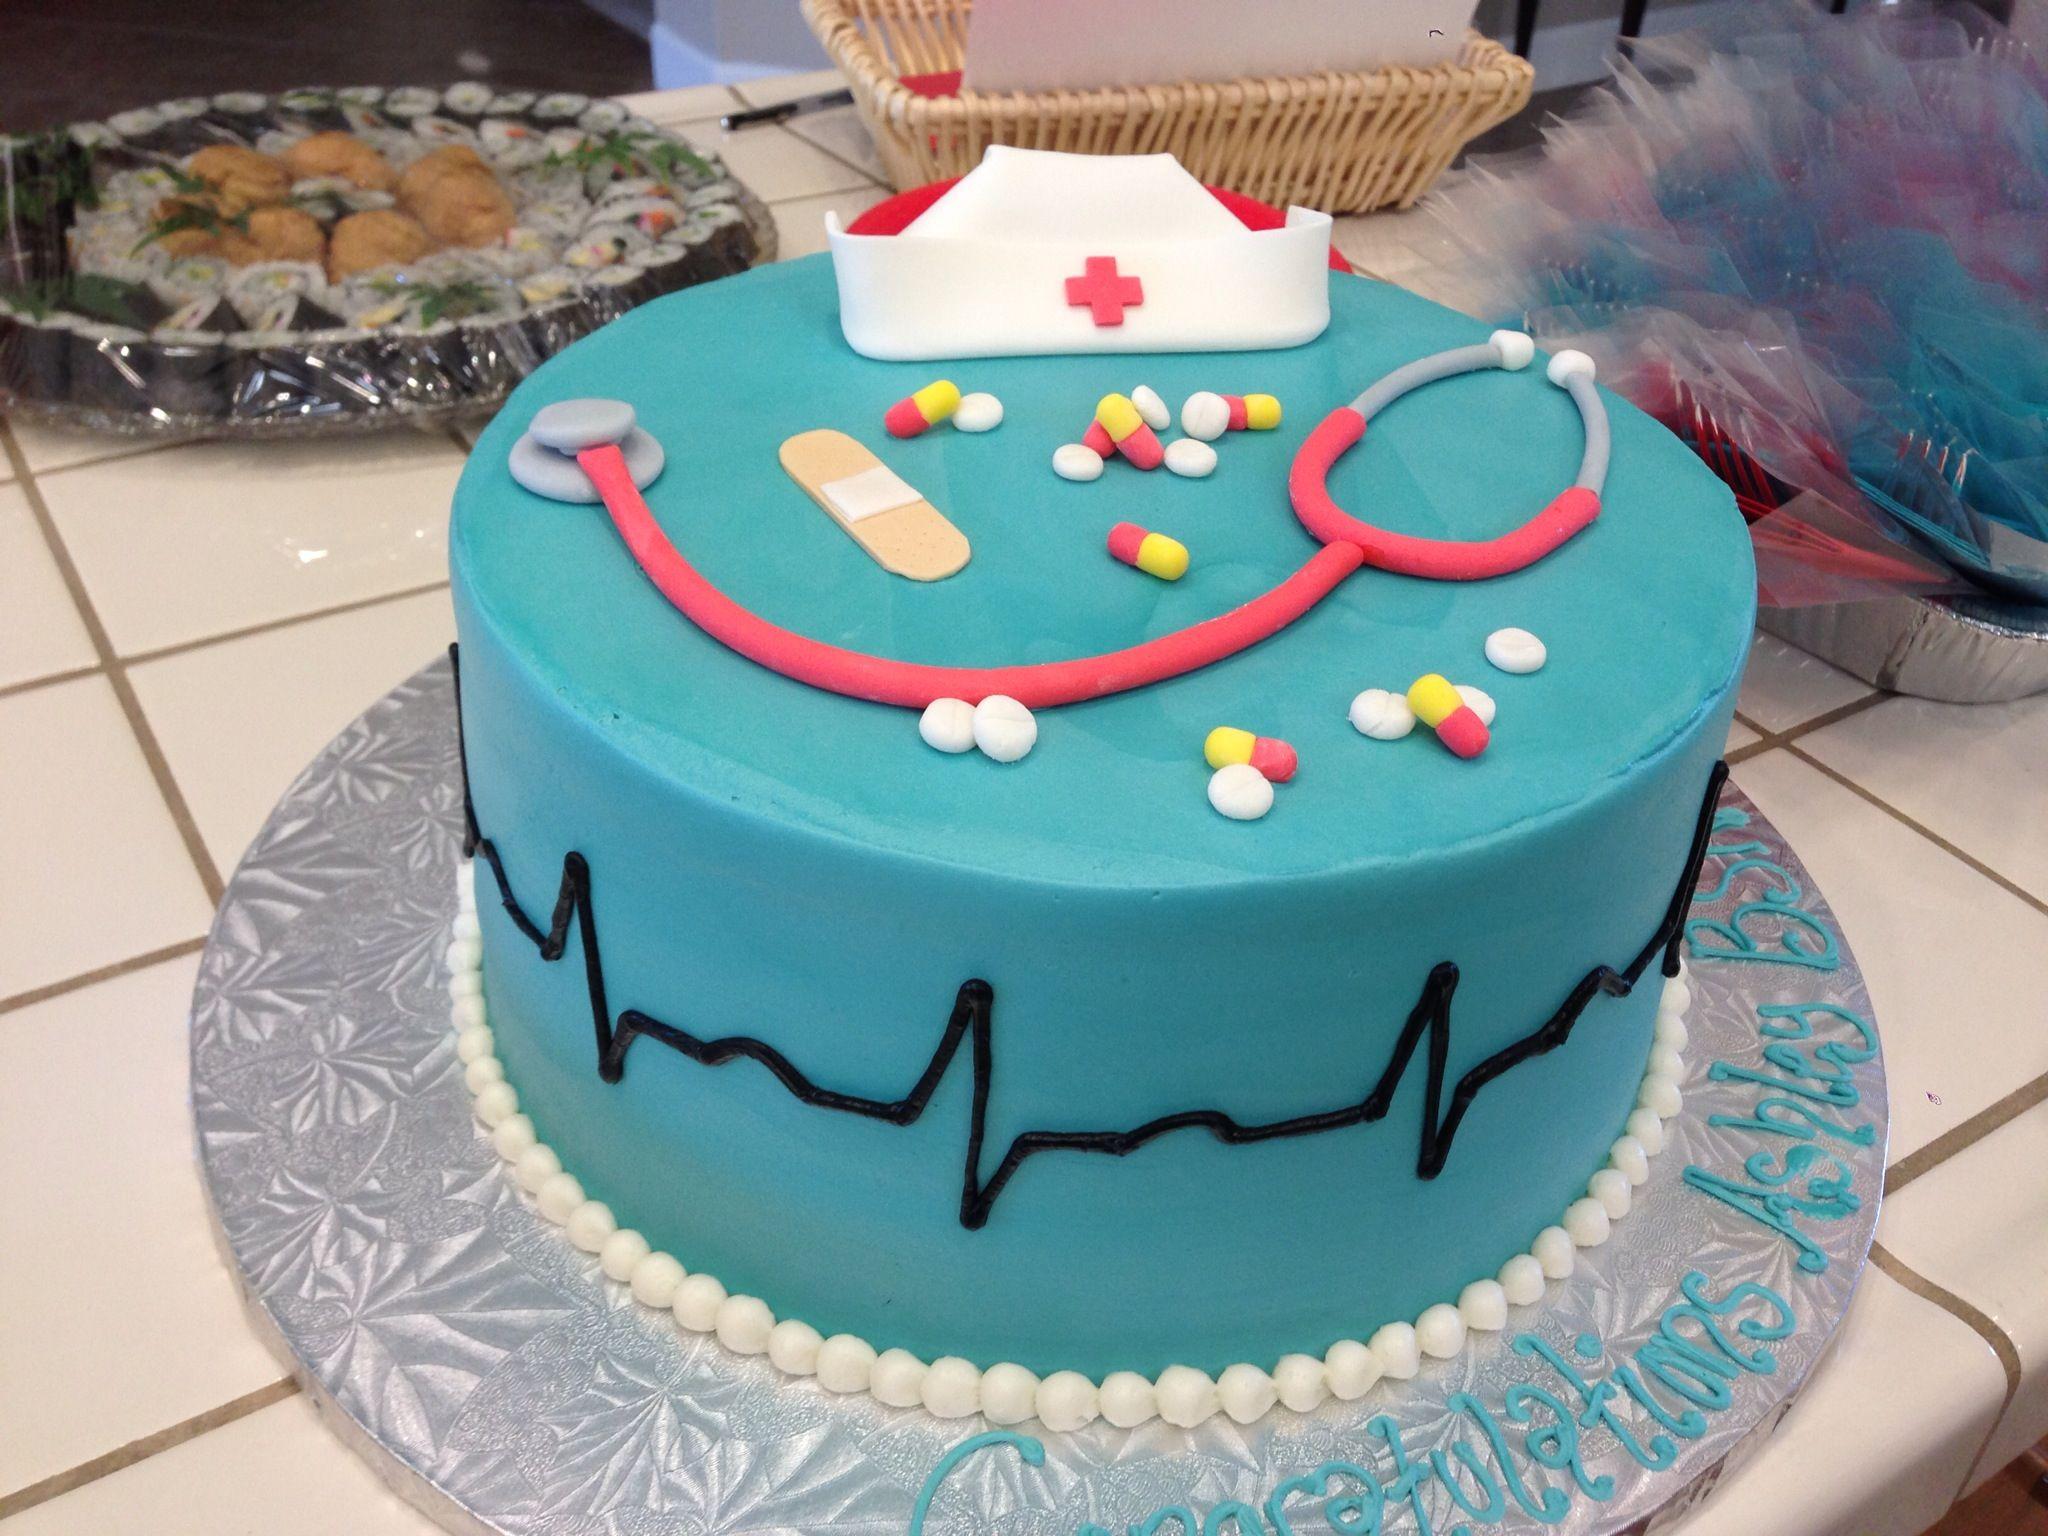 My Amazing Cake At My Nursing Graduation Party